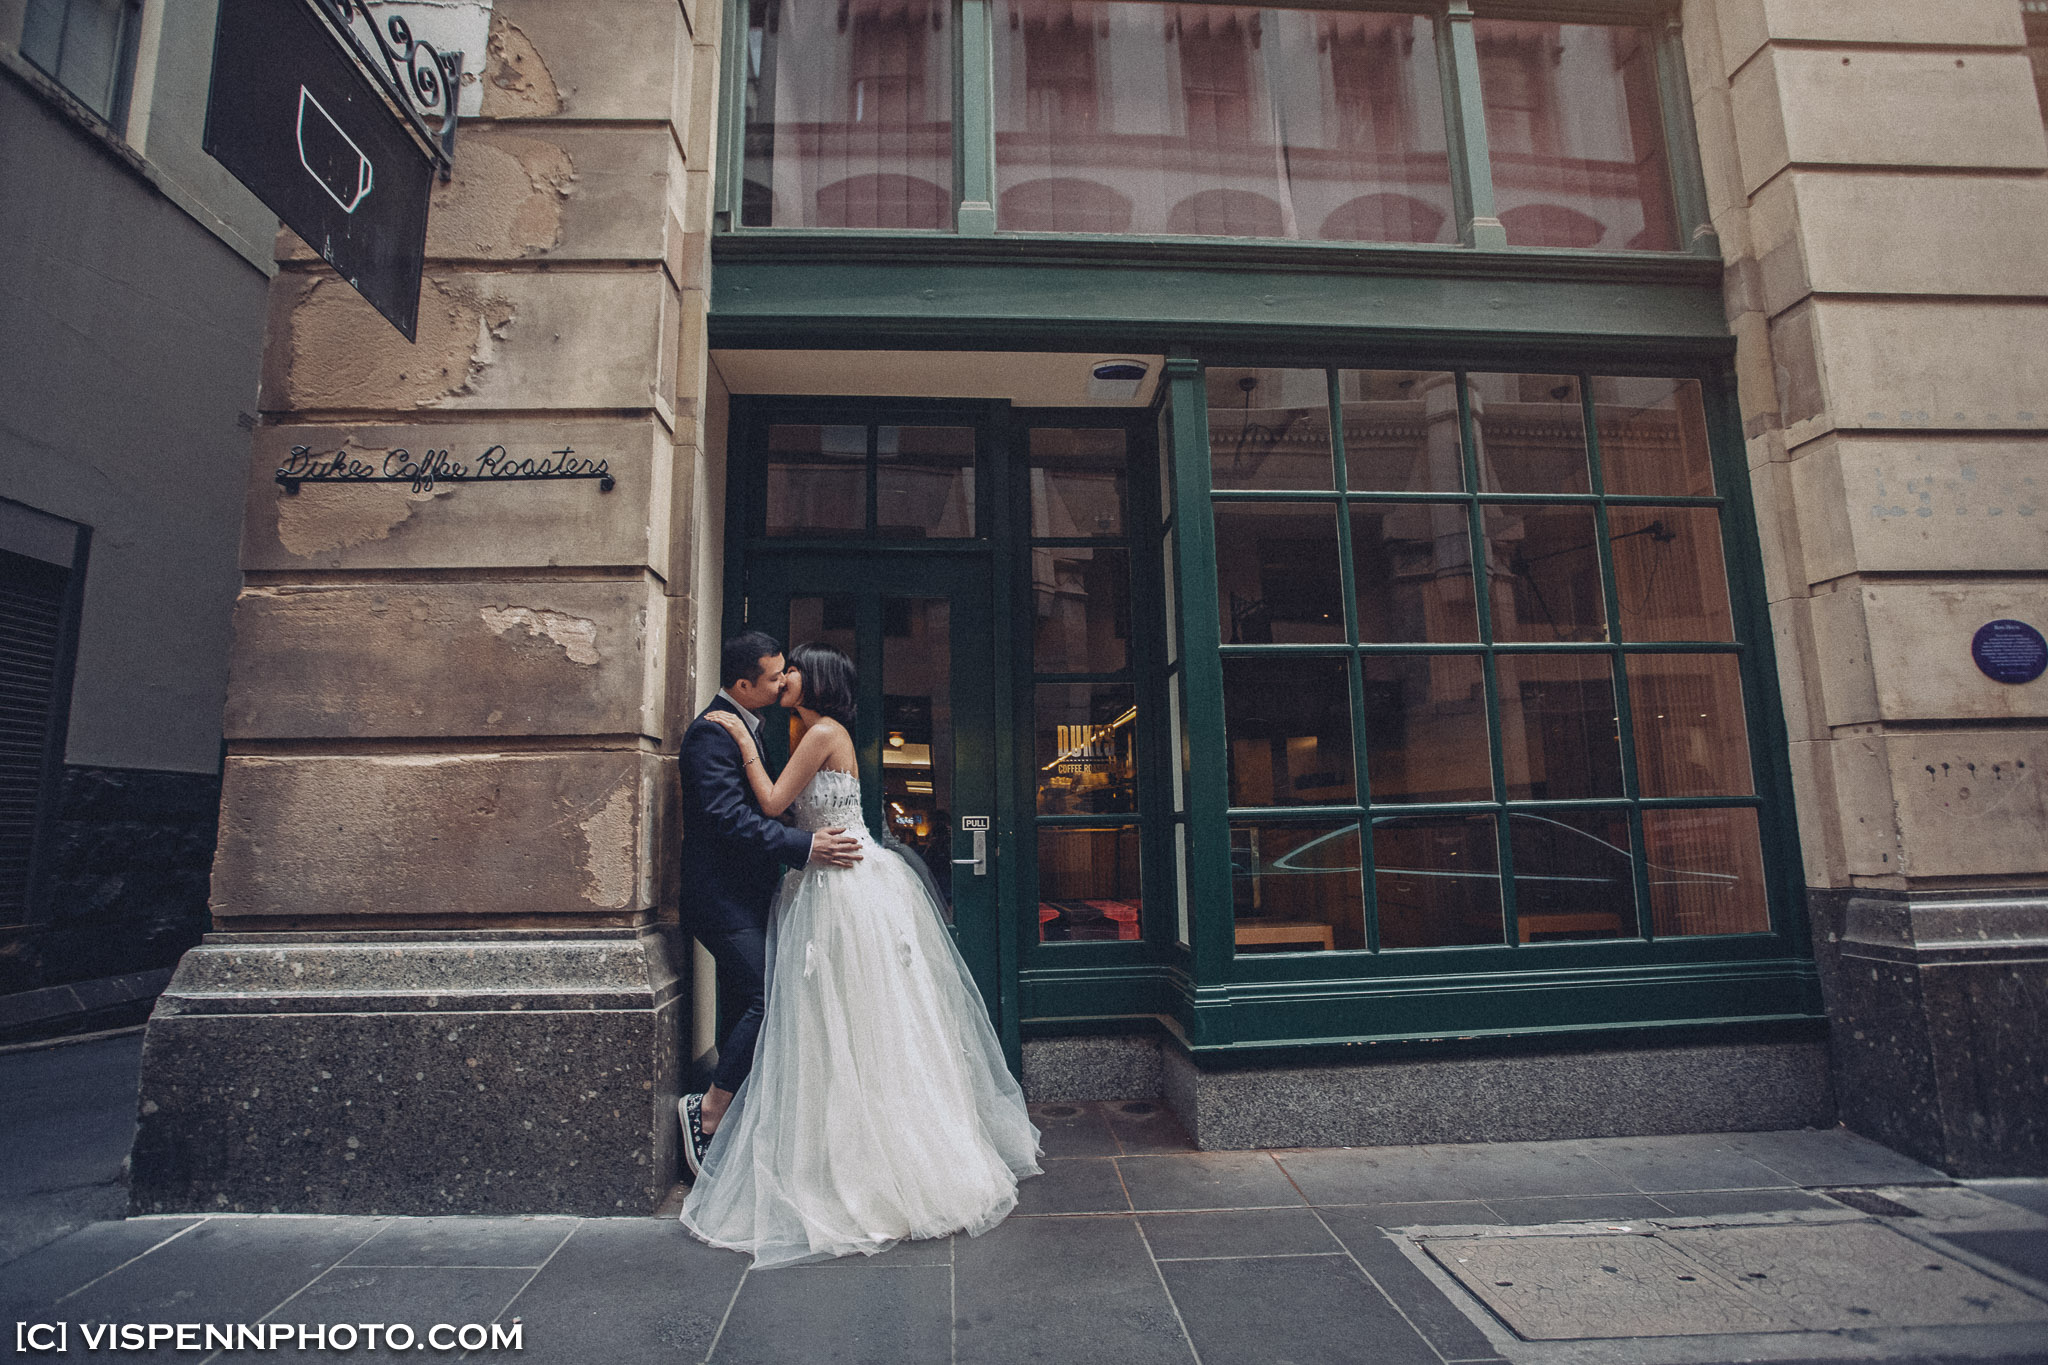 PRE WEDDING Photography Melbourne VISPENN 墨尔本 婚纱照 结婚照 婚纱摄影 5D3 7054